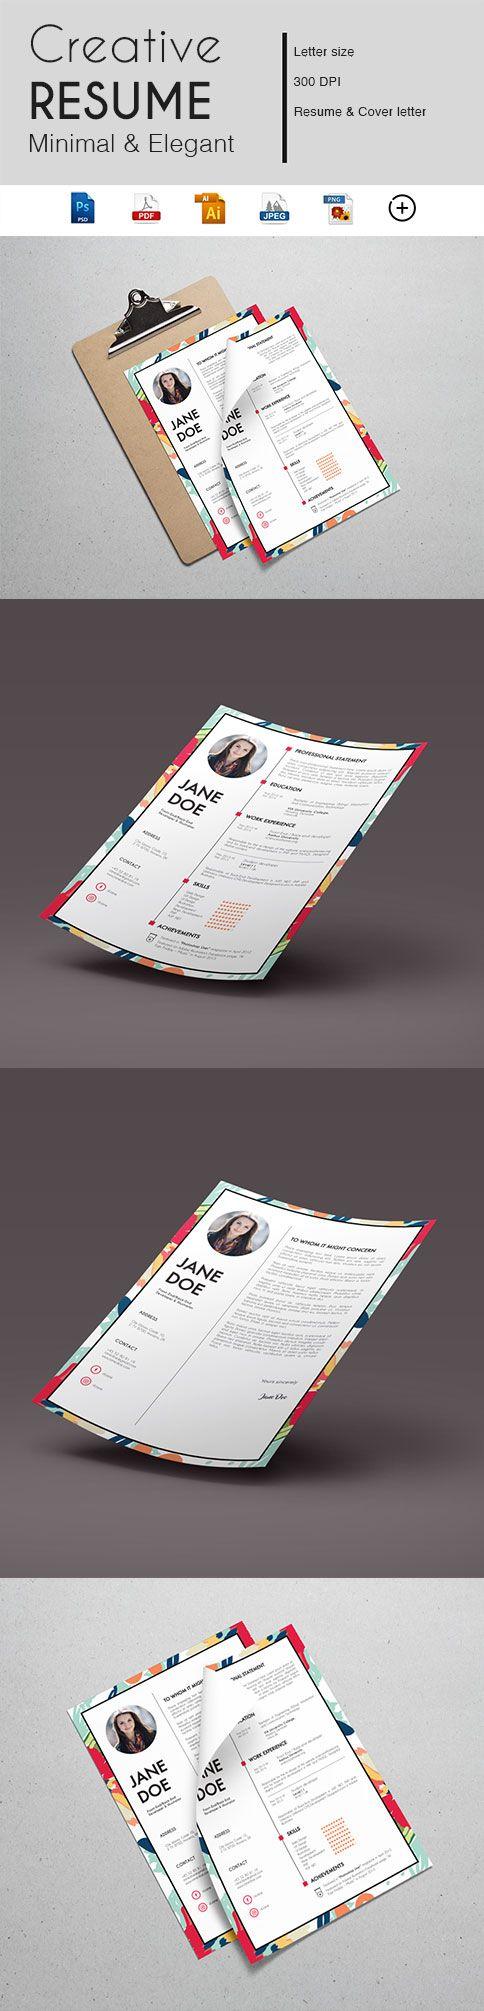 CV Templates Best Modern Resume Design Bundle One Page